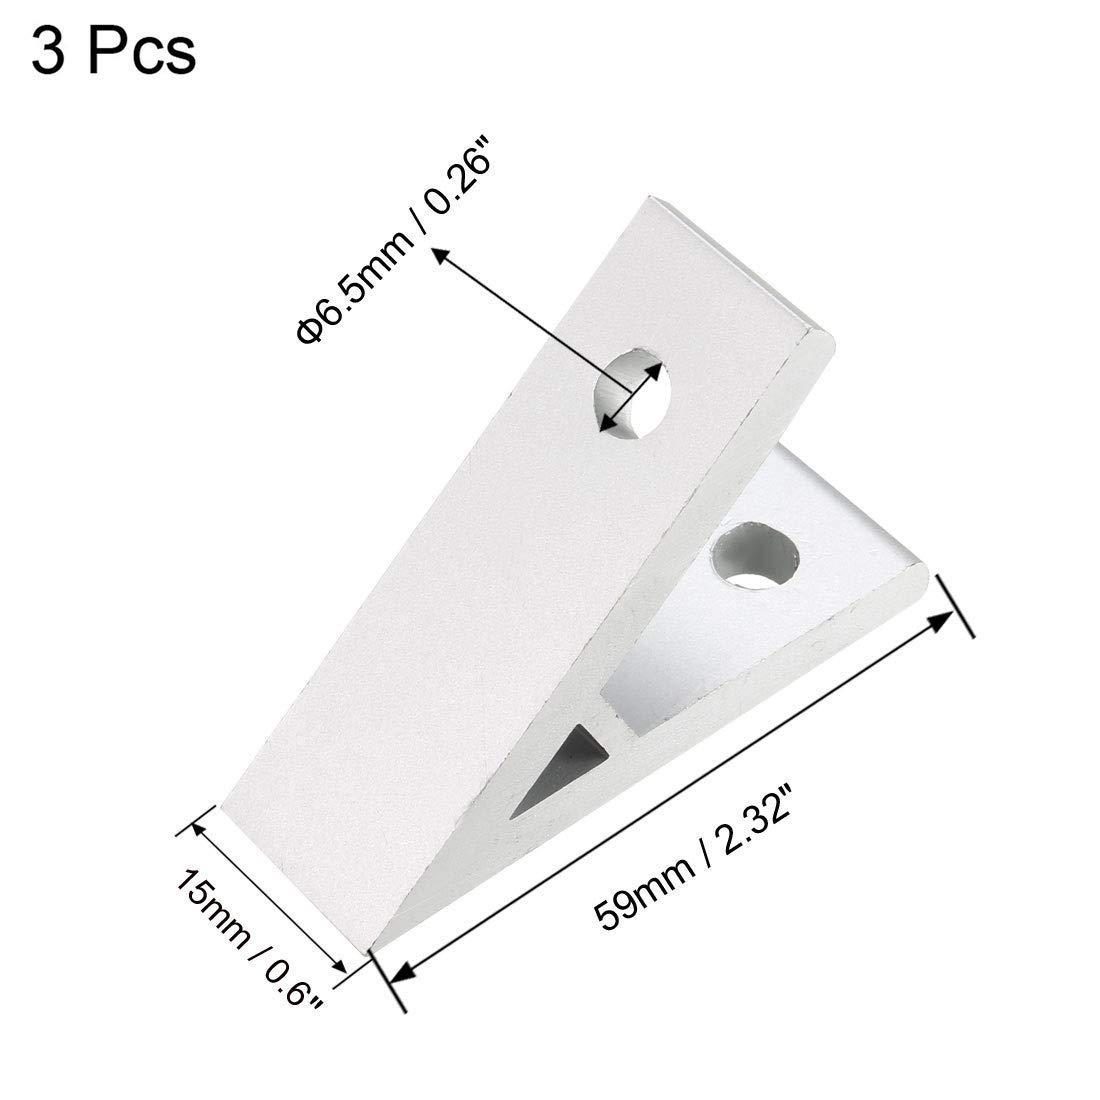 2020 Aluminum Corner Brackets Profile Corner Joint connectors Corner Braces 3 Pieces 45 Degree Angle